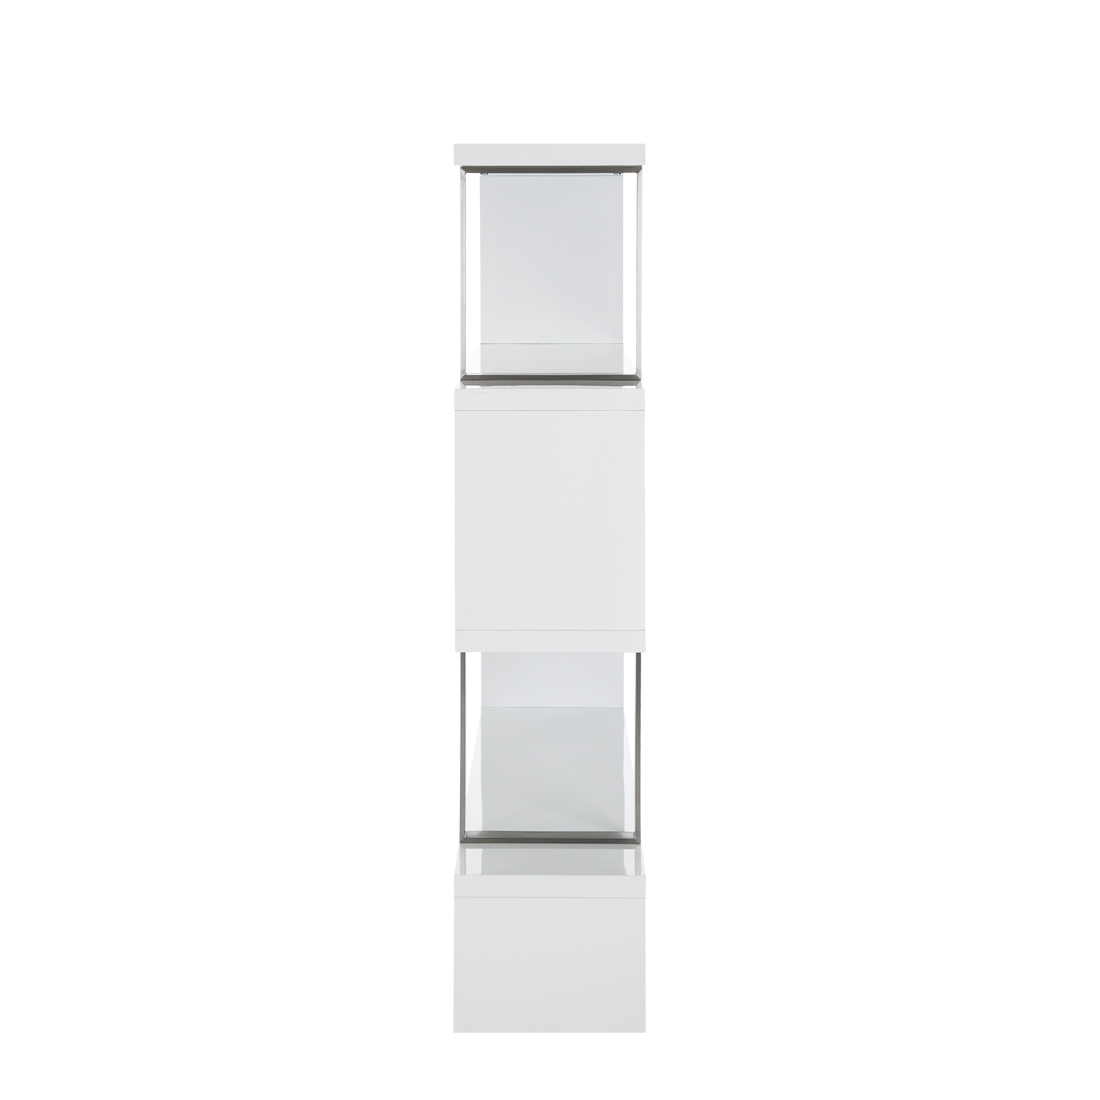 standregal raumteiler wei hochglanz edelstahl b cherregal. Black Bedroom Furniture Sets. Home Design Ideas